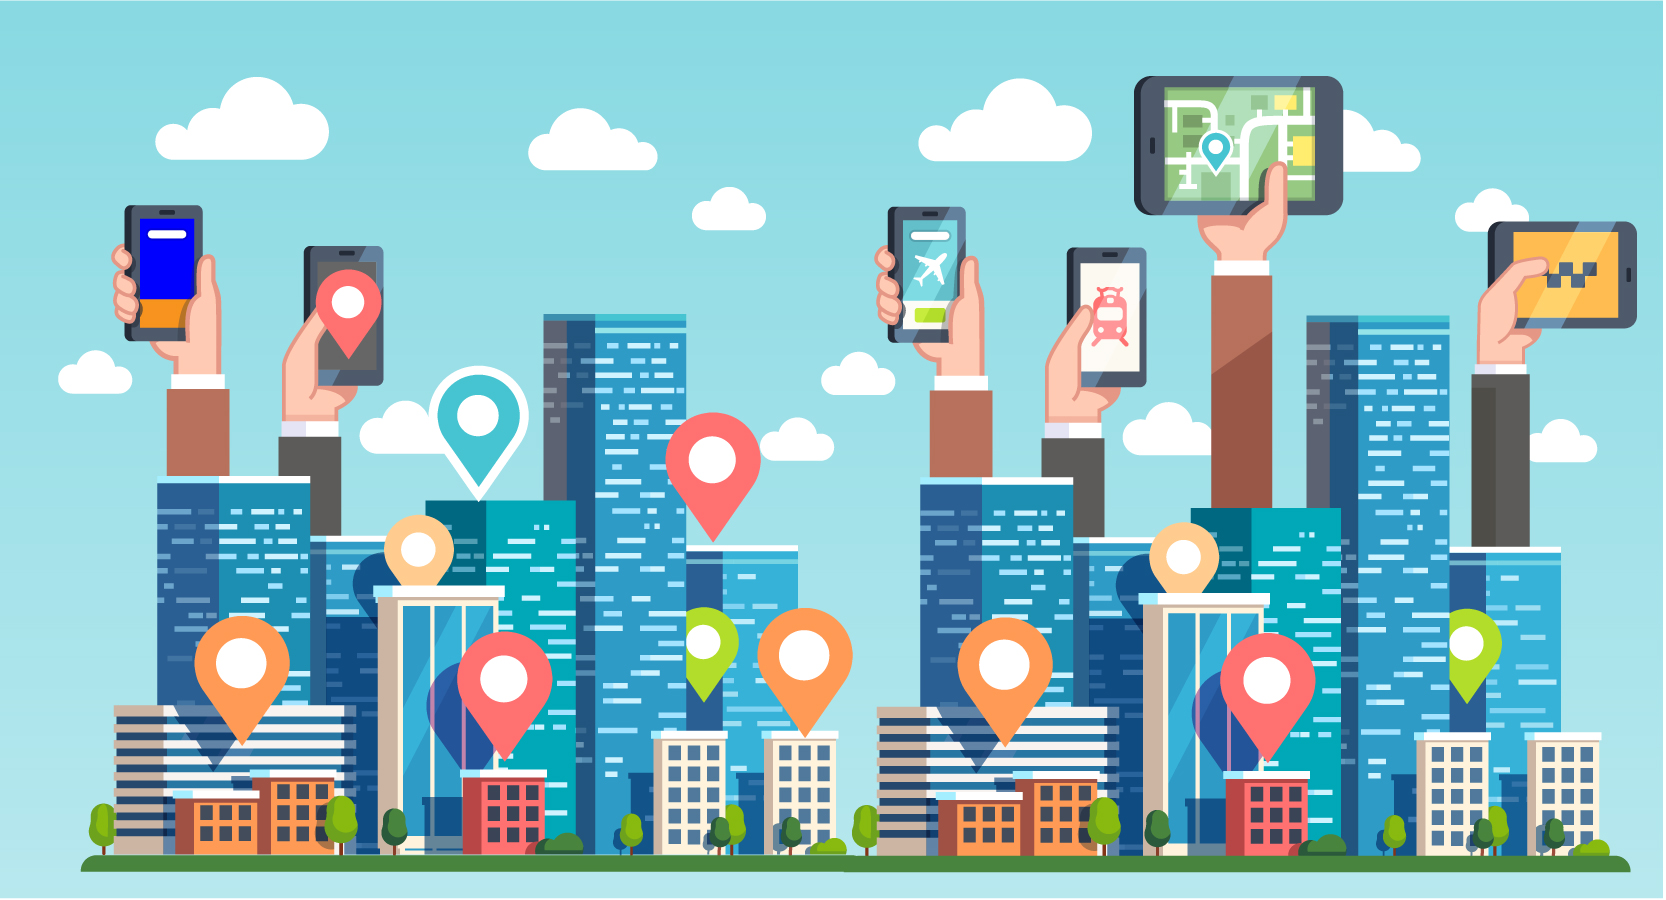 Hyperlocal Service Market Bigger Than Expected | Airtasker, Swapbox Inc.,Porch, Handy, AskForTask